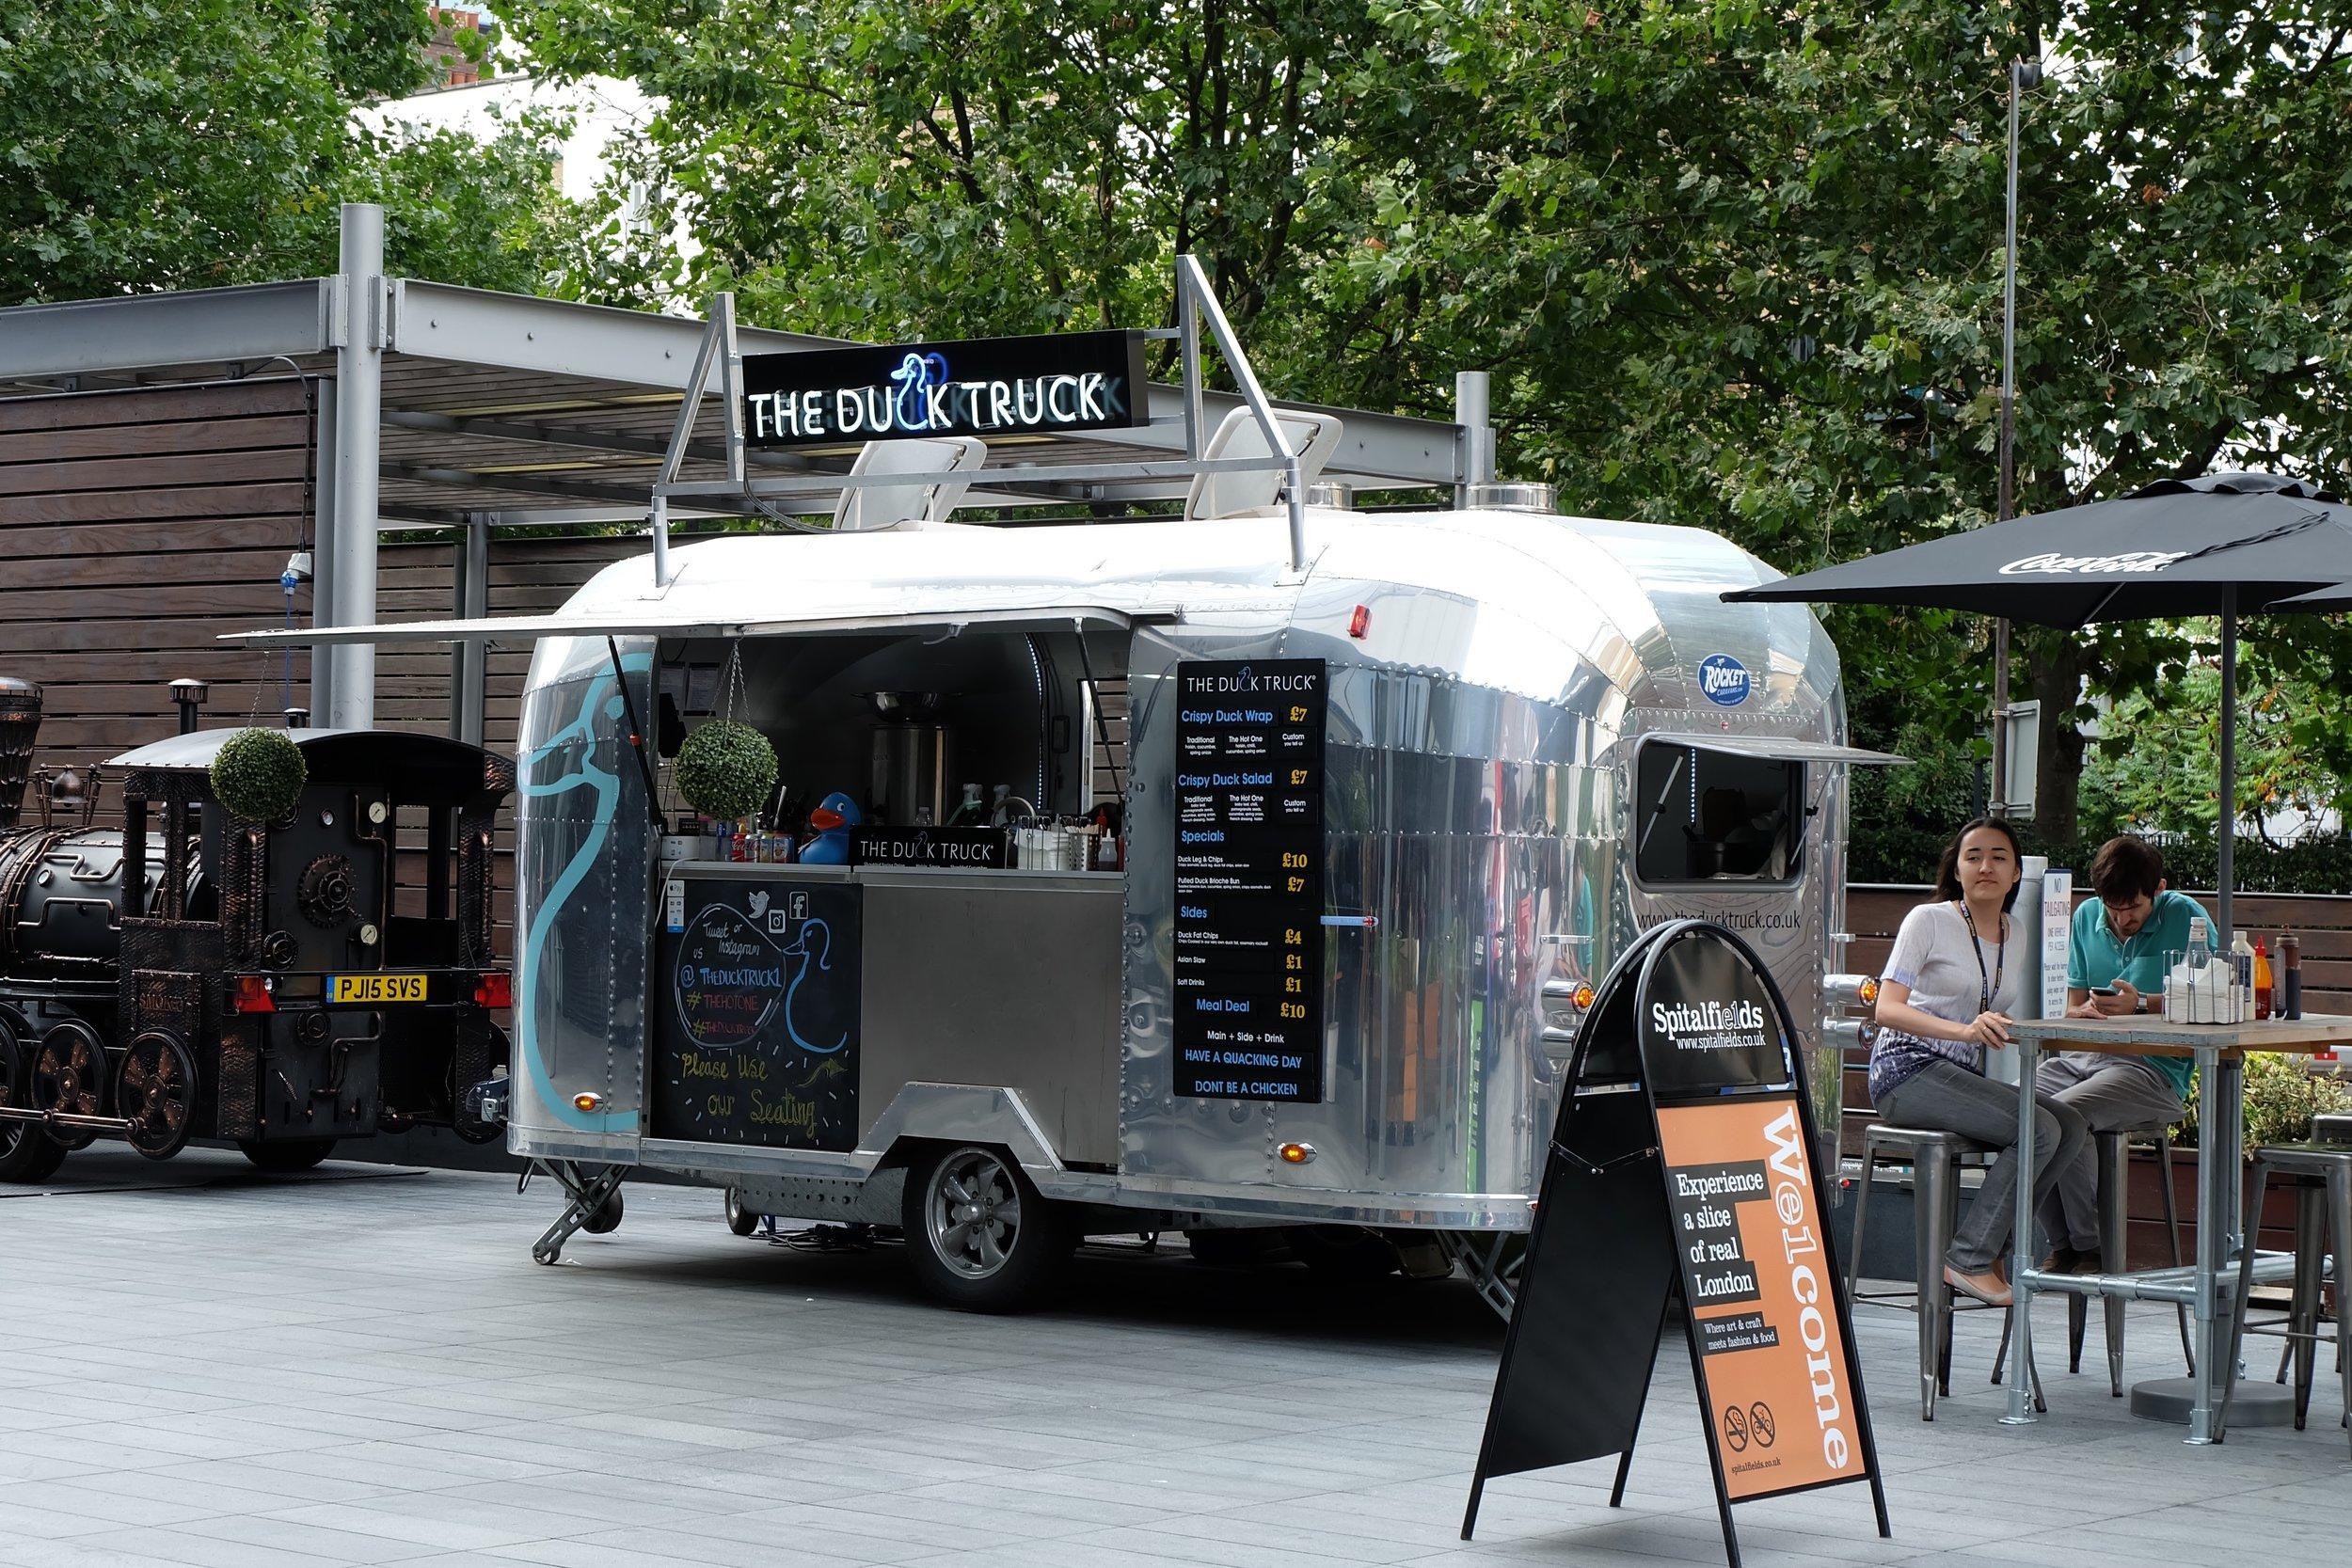 The Duck Truck at Spitalfields Market